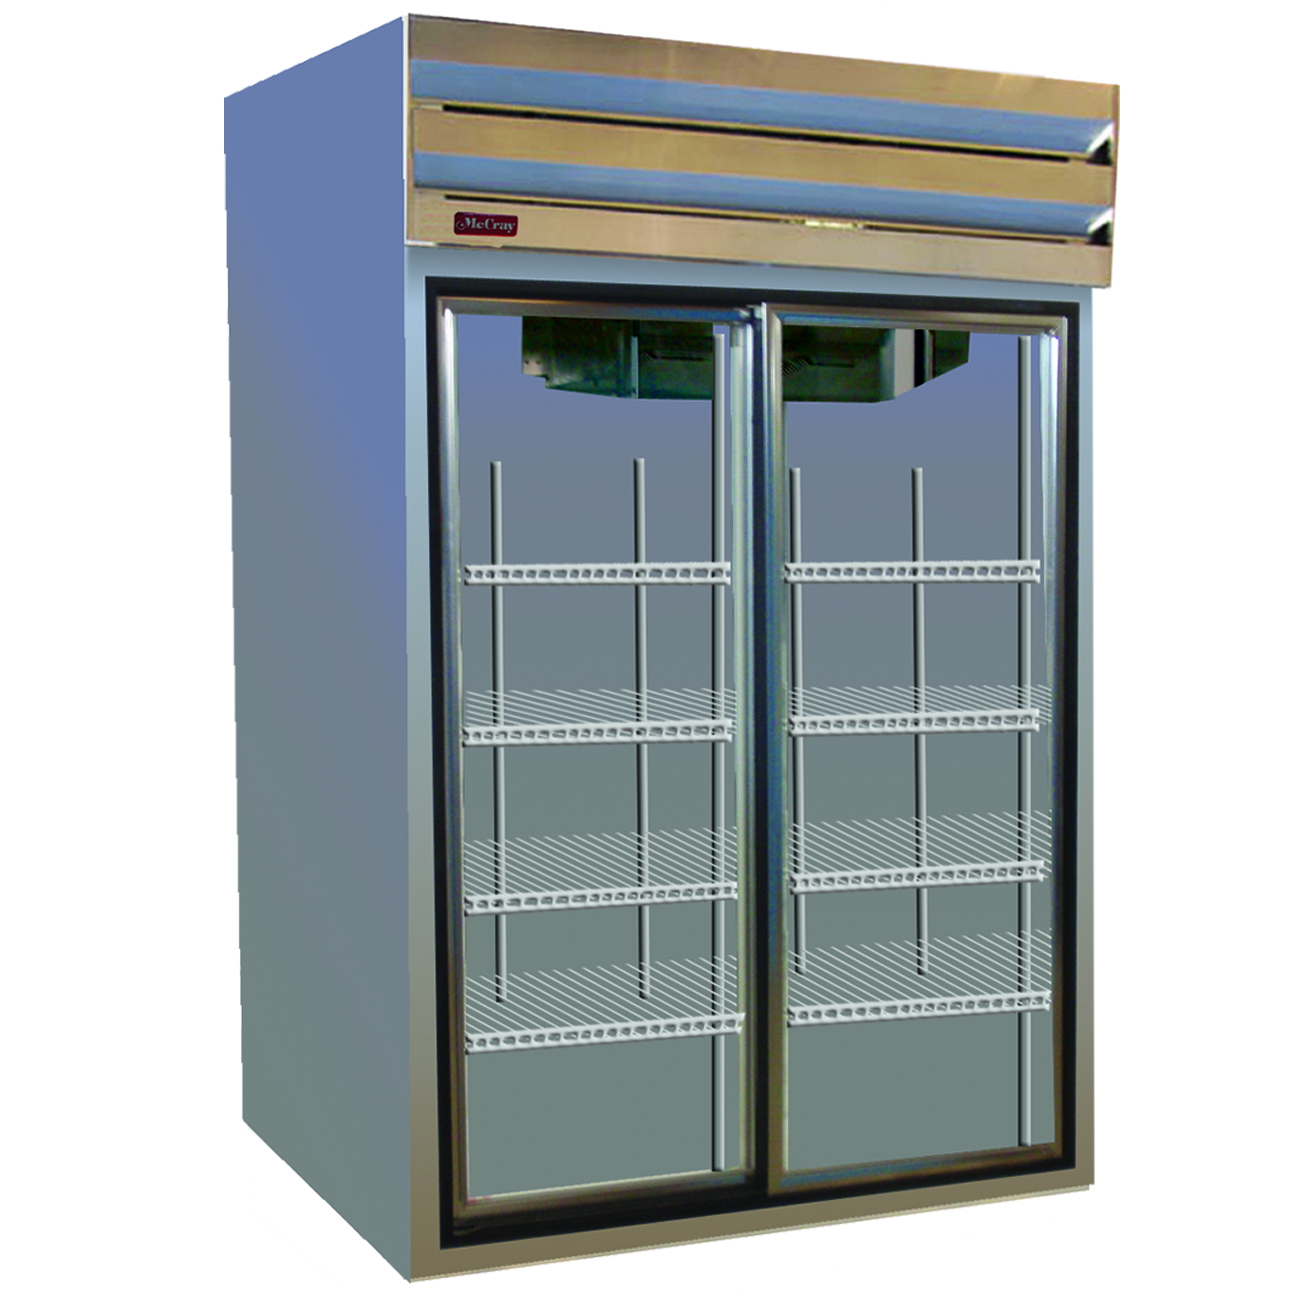 Howard-McCray GSR48-S refrigerator, merchandiser